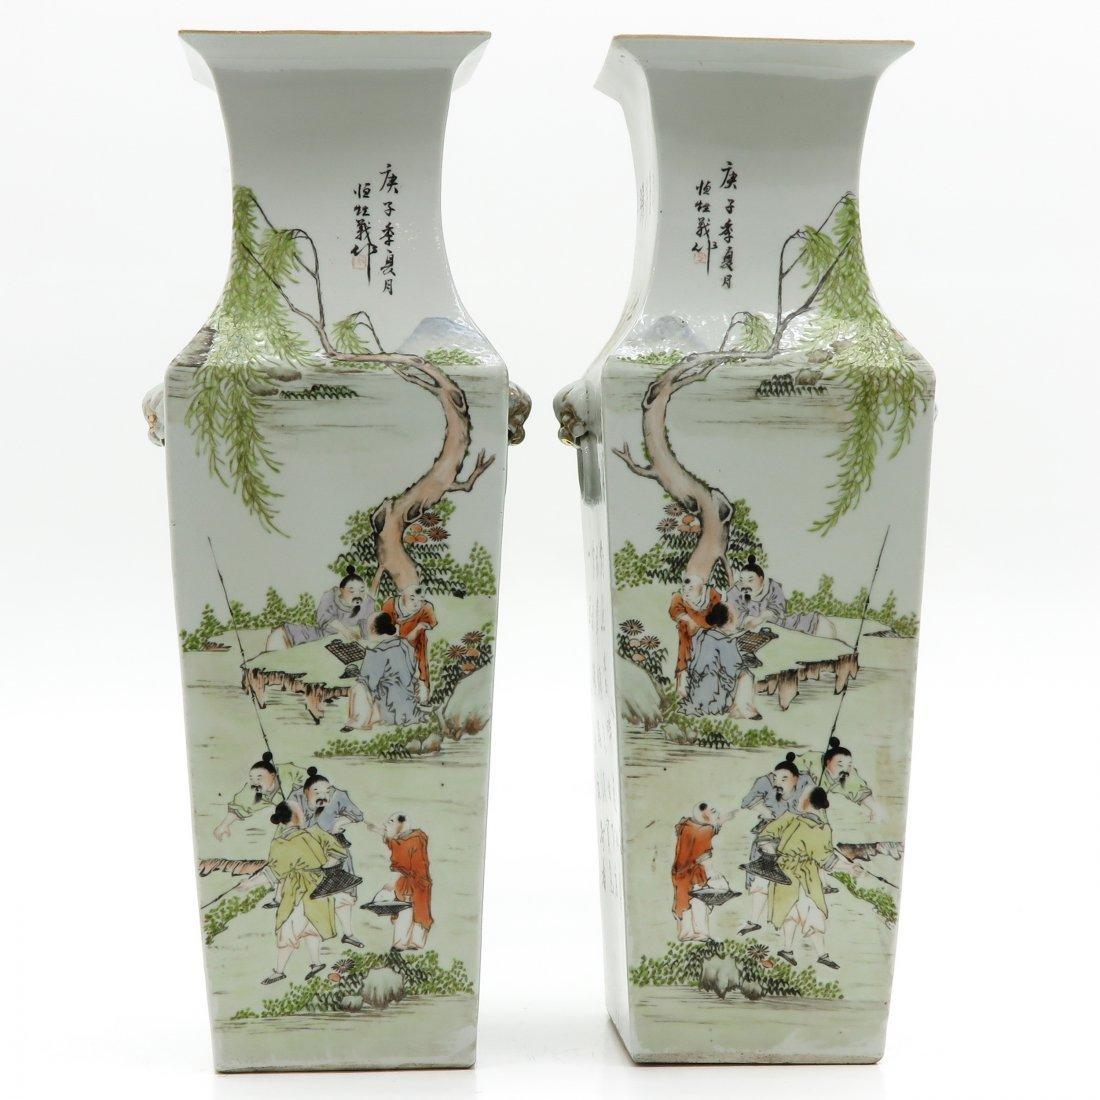 Pair of China Porcelain Vases